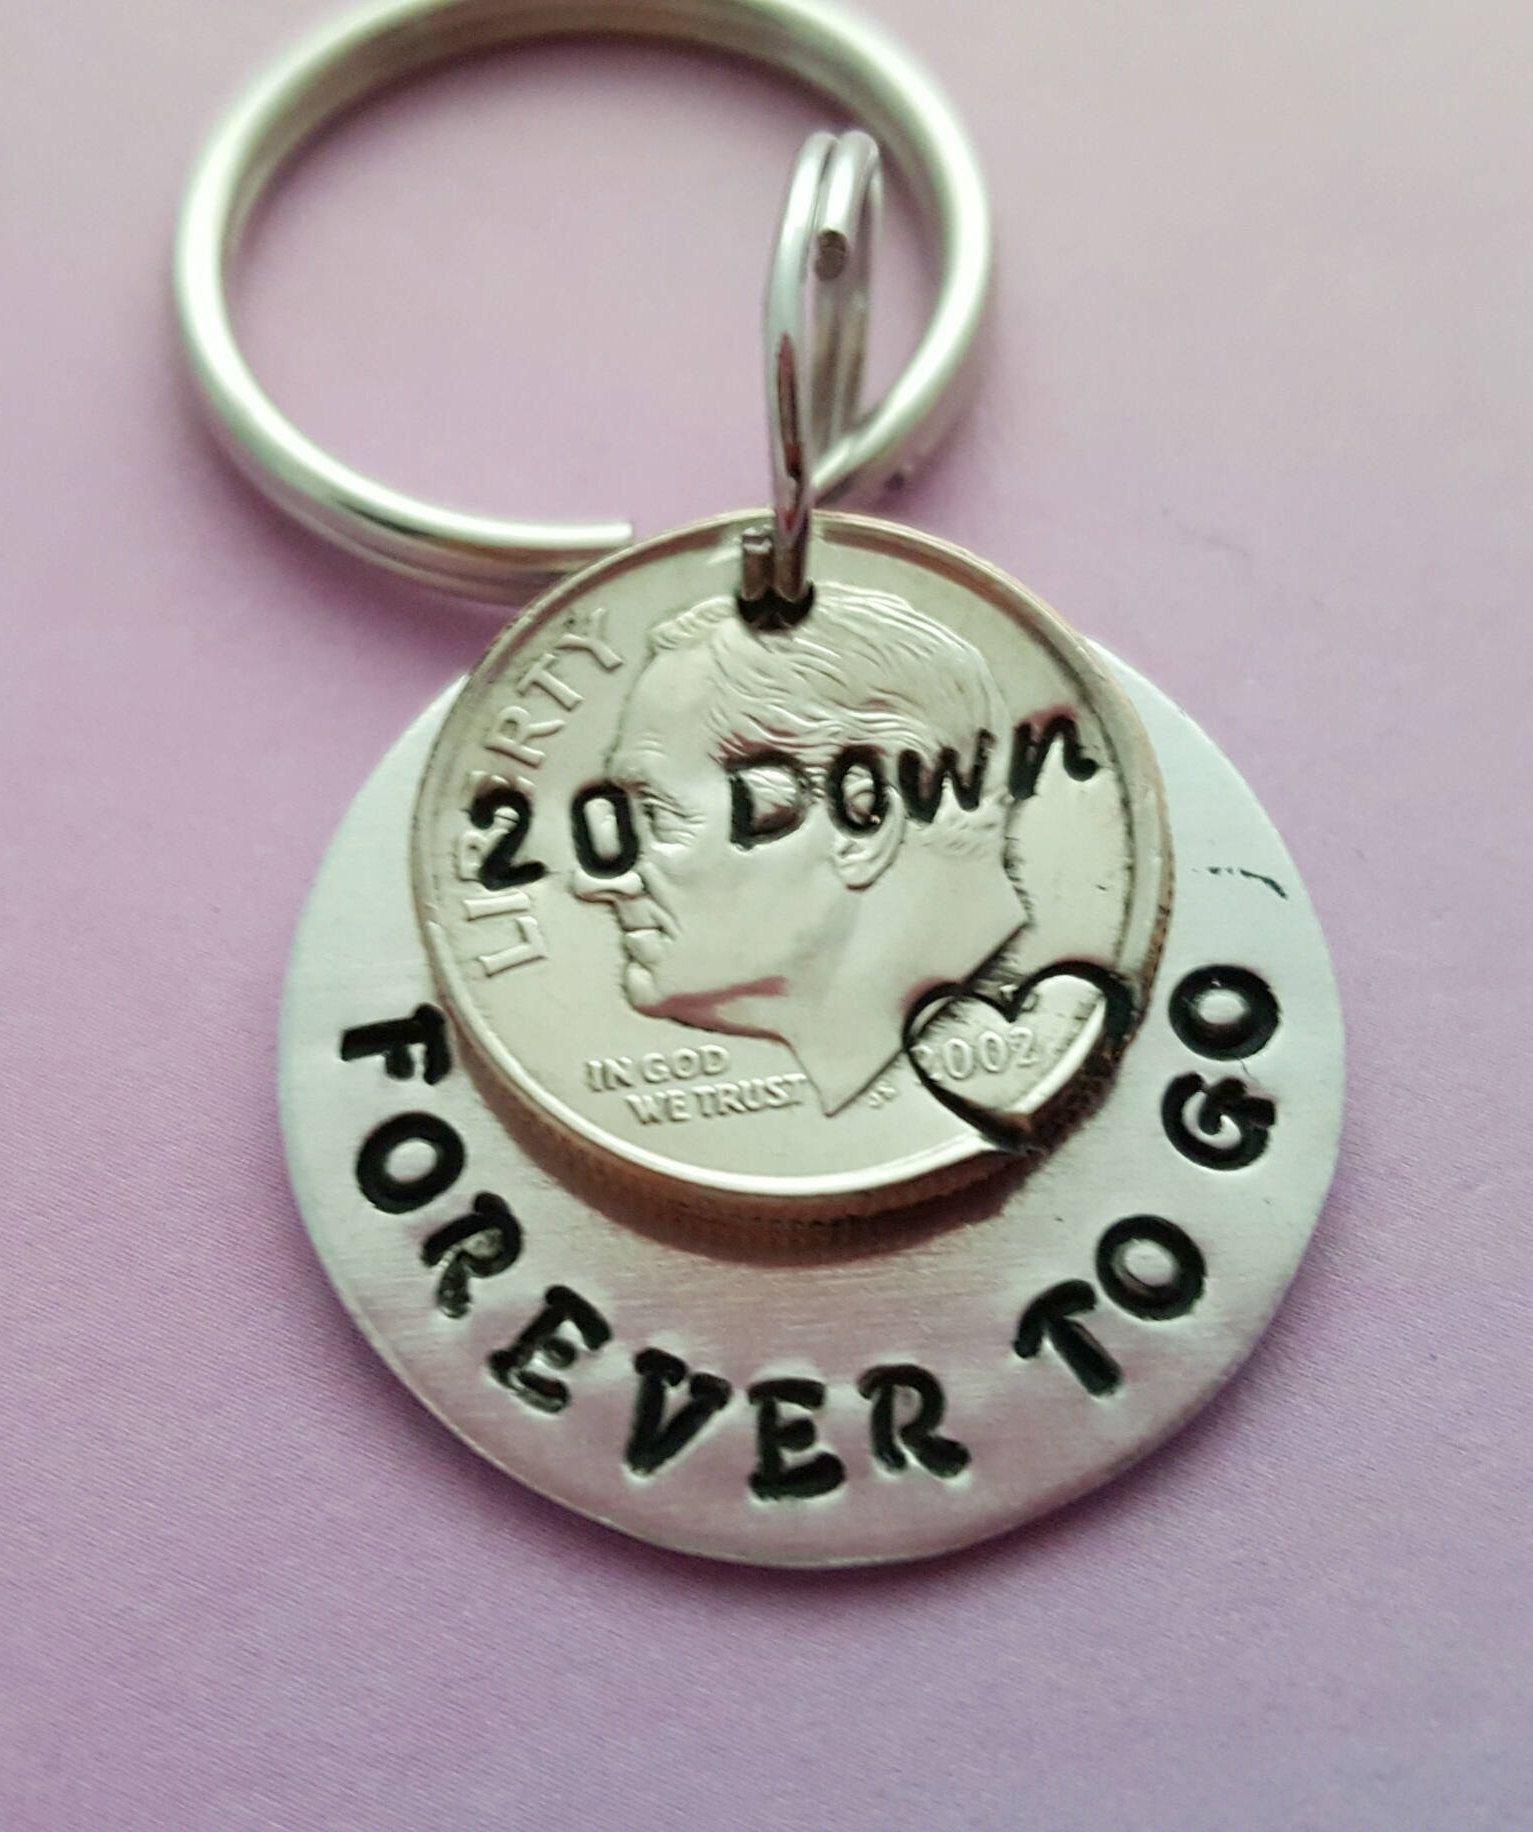 10 Elegant 20Th Wedding Anniversary Gift Ideas For Her 20th anniversary gift idea 20 year wedding anniversary keychain 6 2021